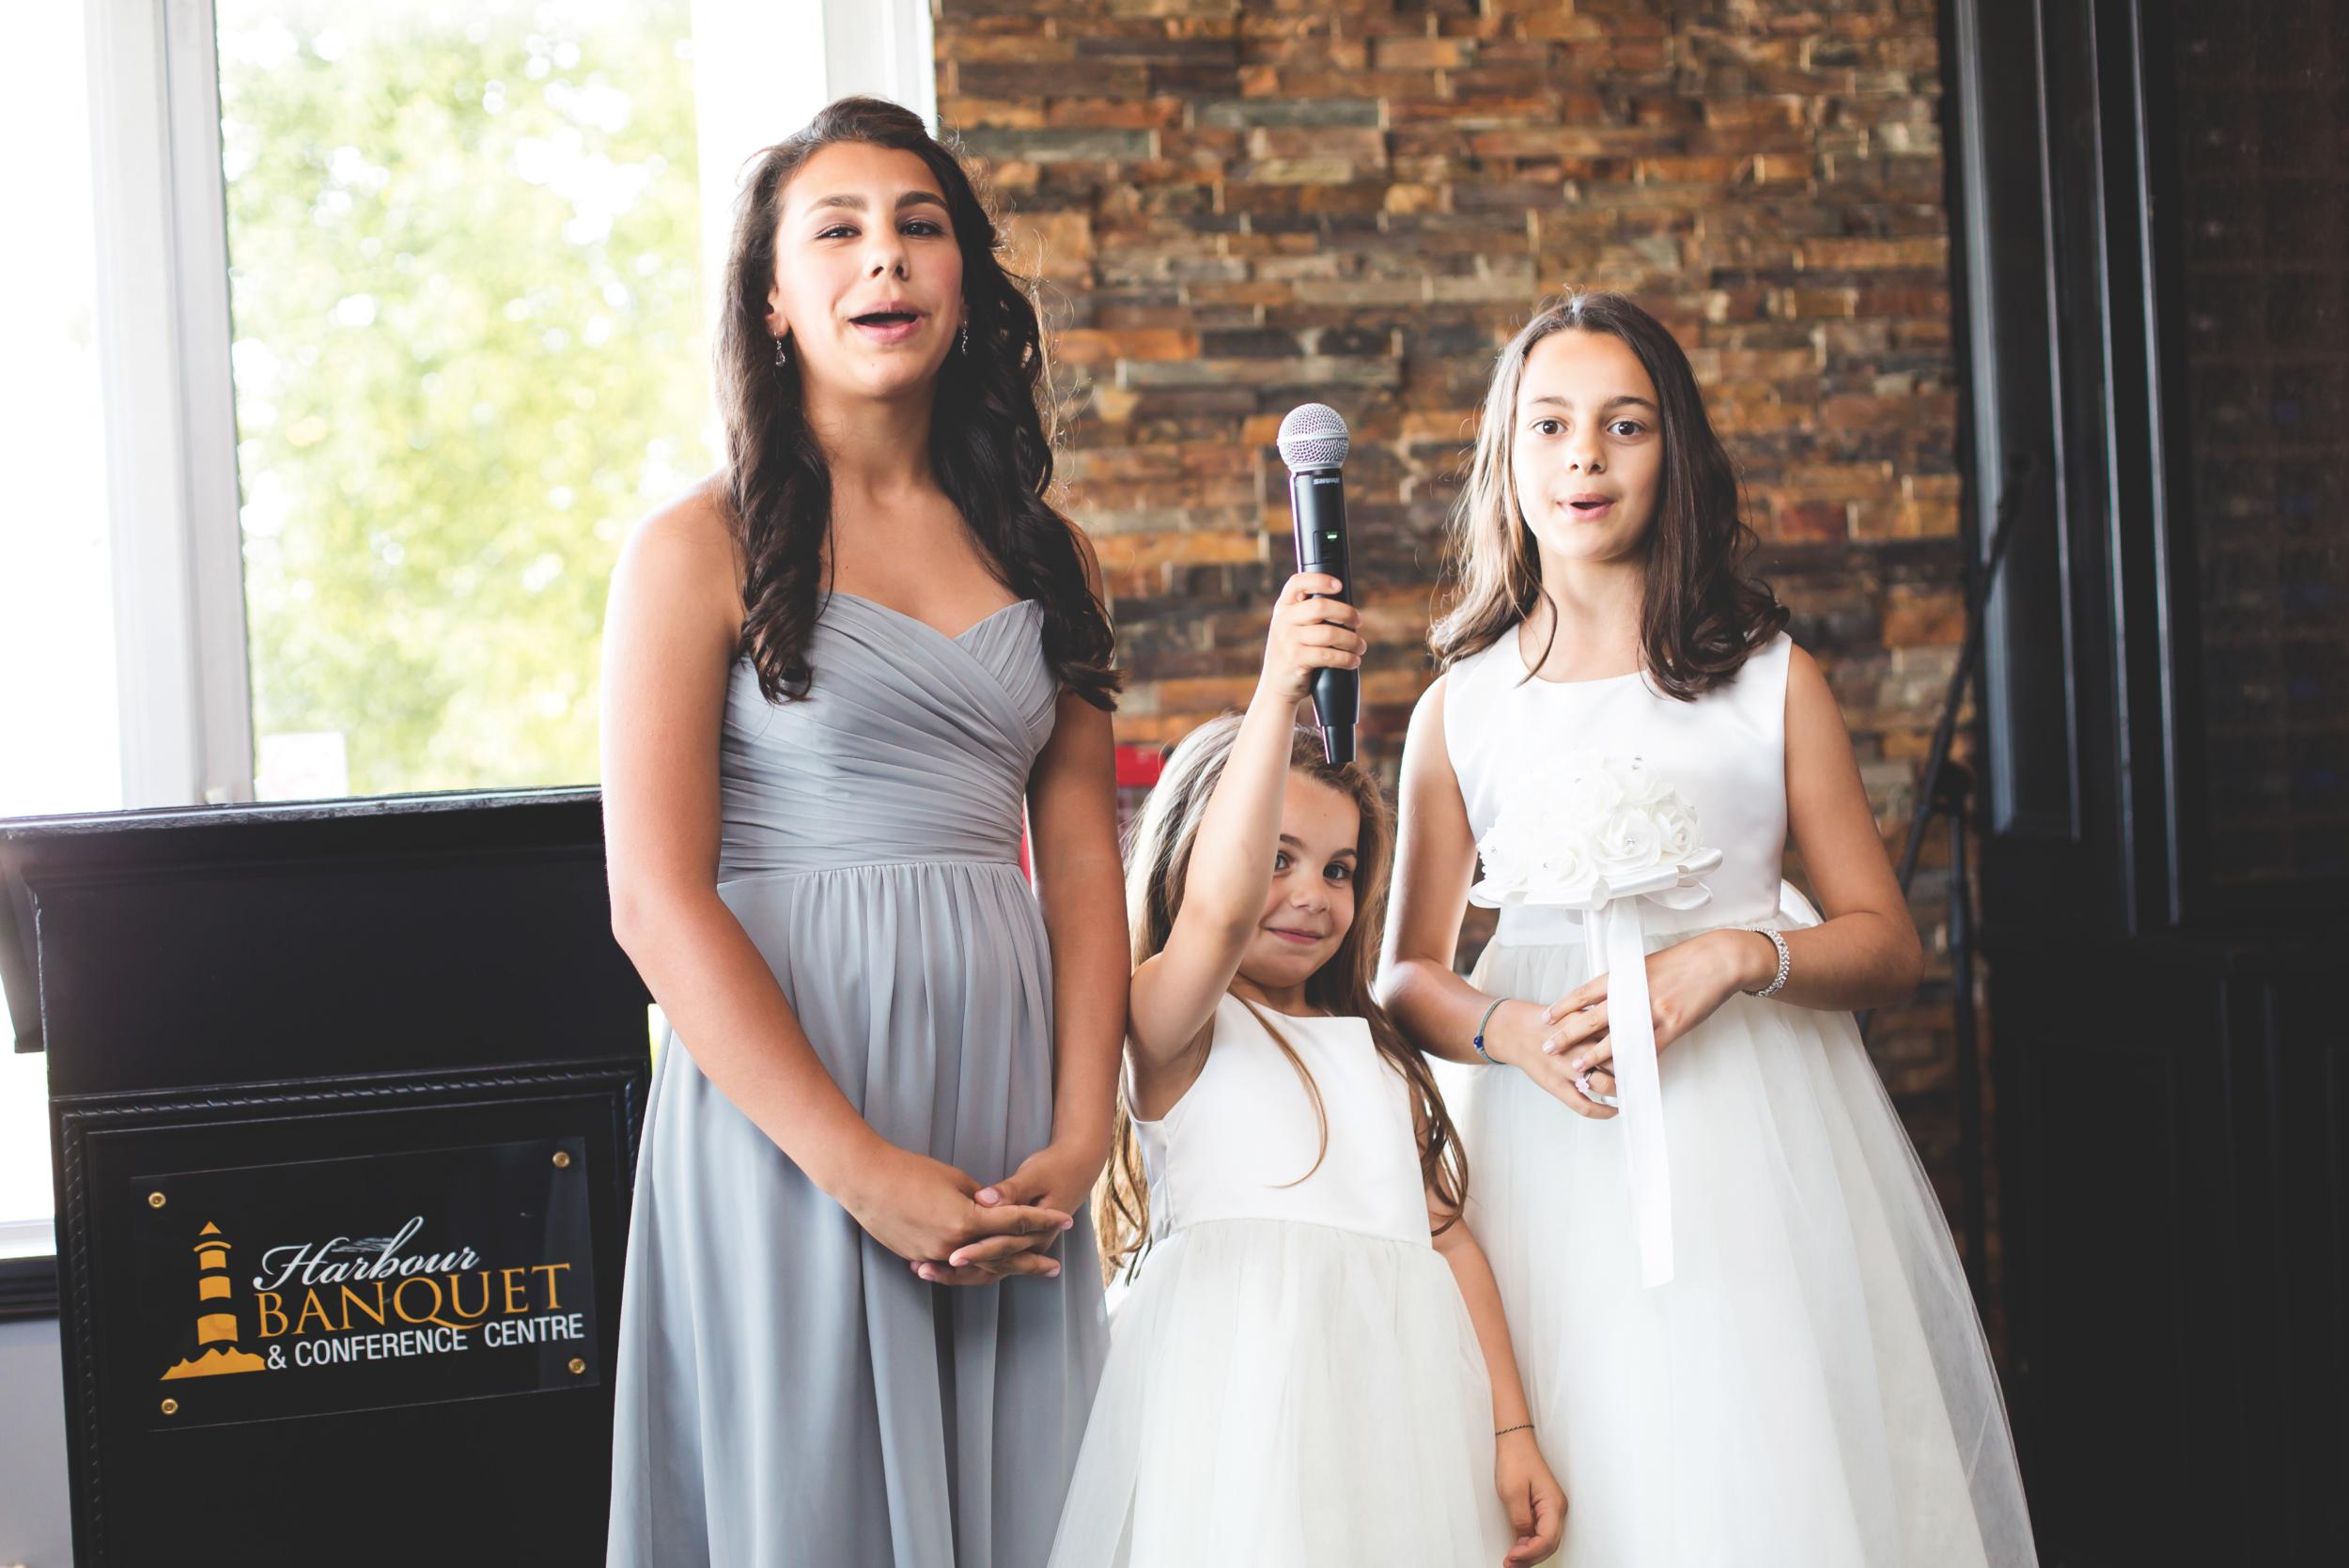 Wedding-Harbour-Banquet-Center-Oakville-Photographer-Wedding-Hamilton-Saint-James-Espresso-Downtown-HamOnt-GTA-Niagara-Toronto-Moments-by-Lauren-Photography-Photo-Image-58.png